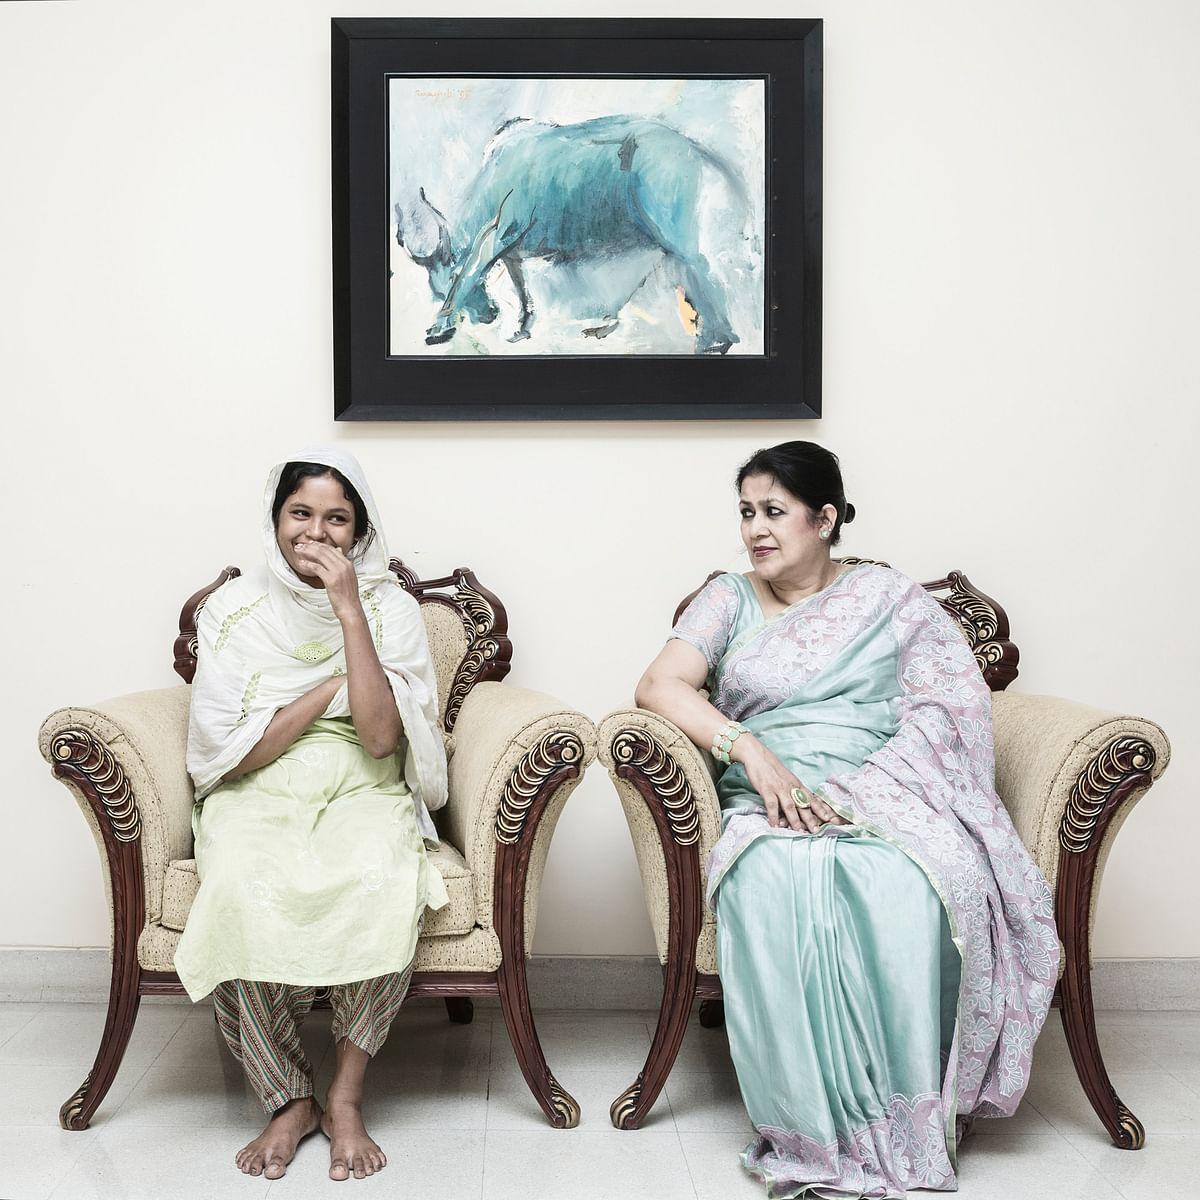 Maya's next project will be an eye opening series on the middle-class housewives of Bangladesh.(Photo Courtesy: Jannatul Mawa)